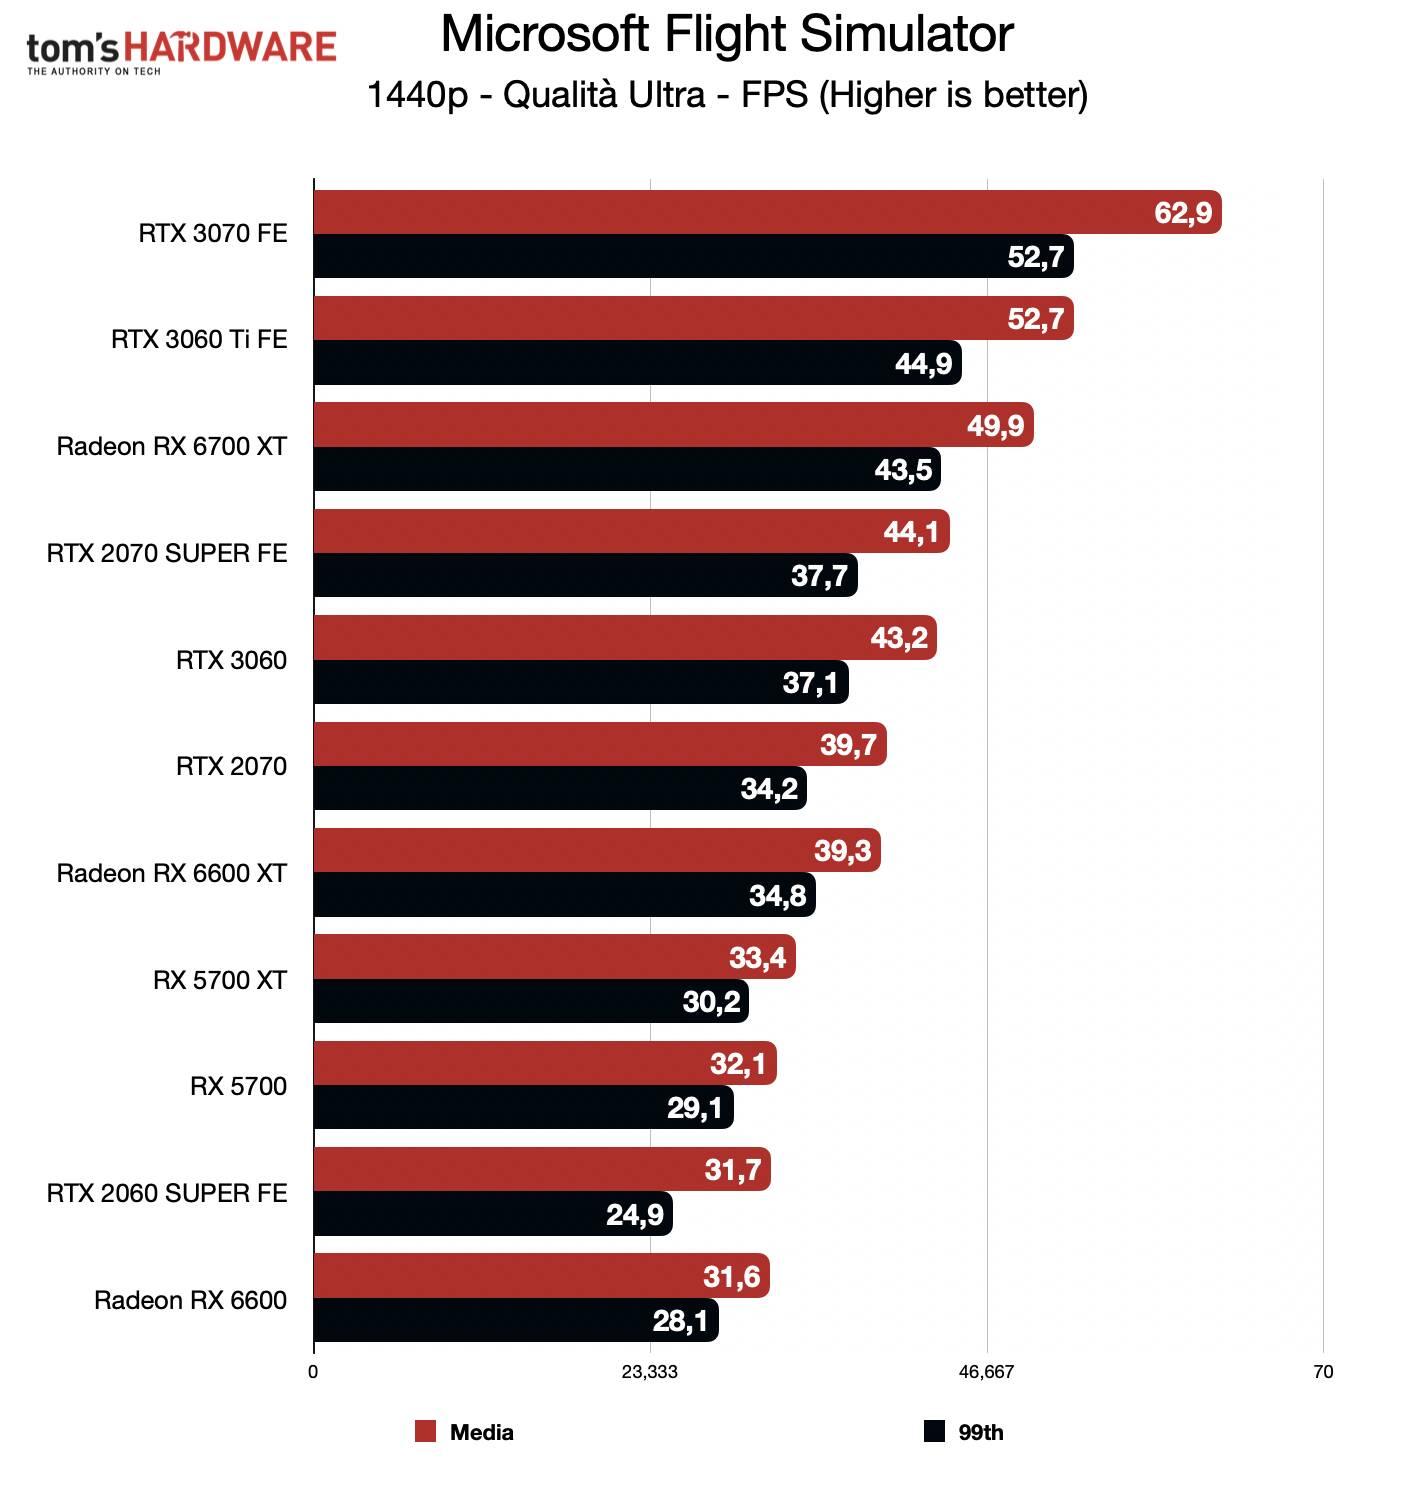 Benchmark Radeon RX 6600 - QHD - Microsoft Flight Simulator